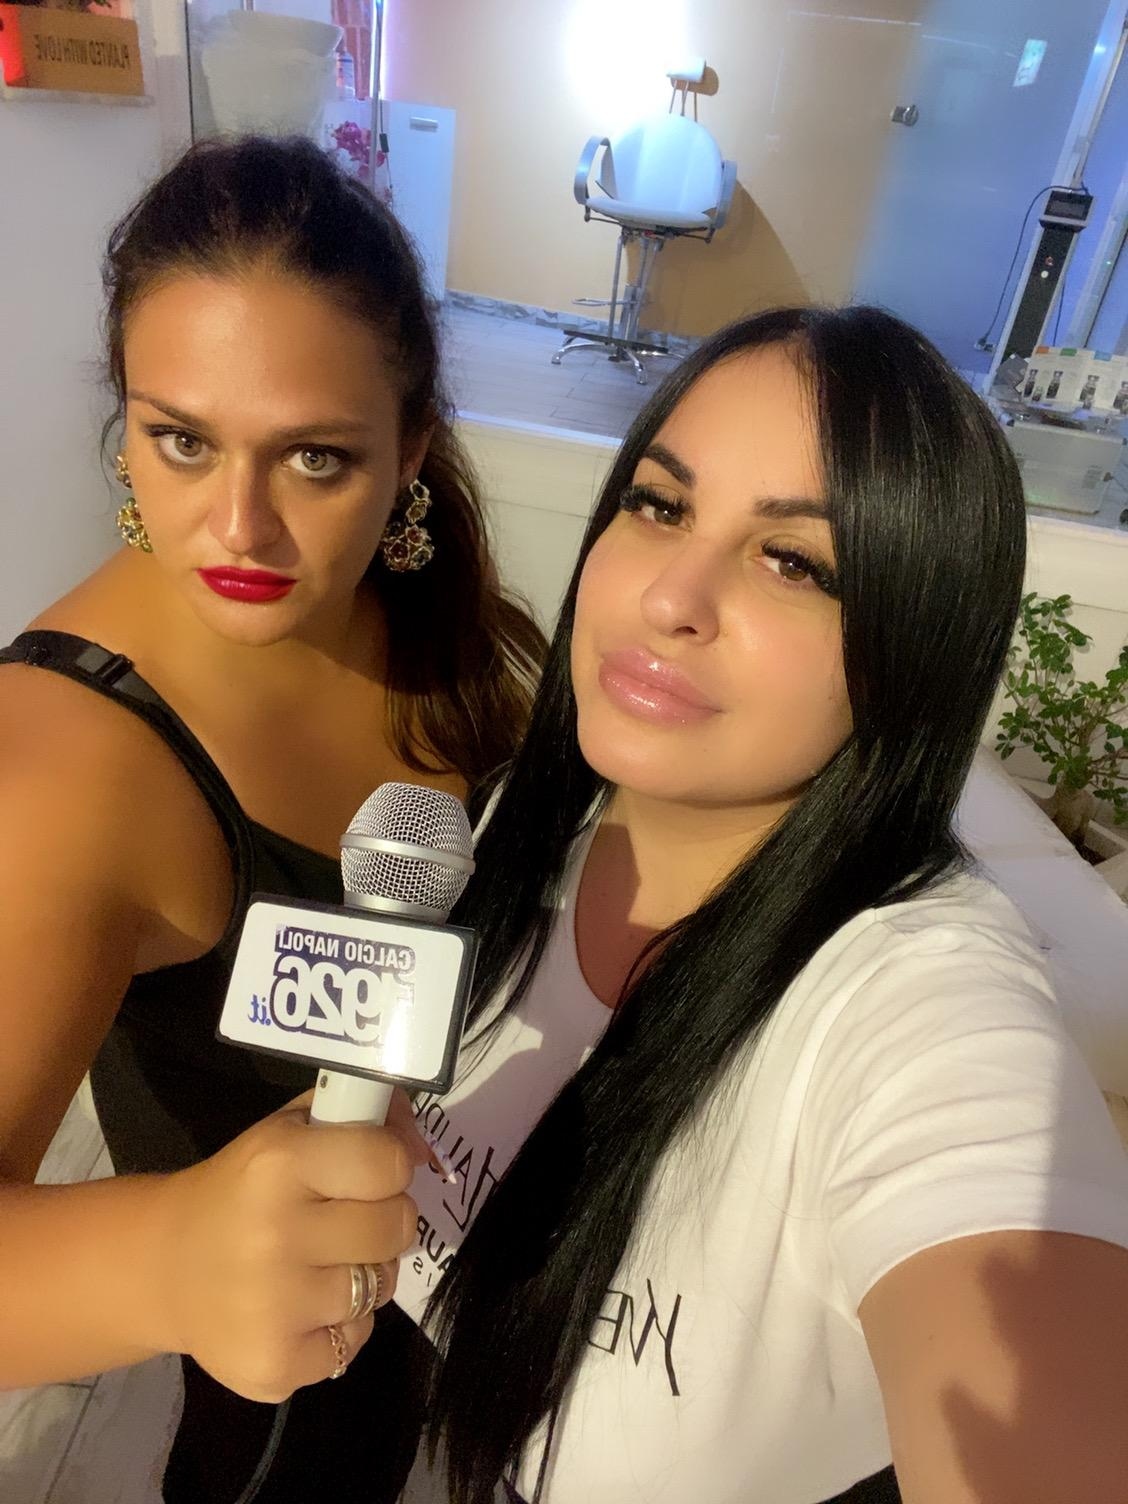 Tilde Mendes intervista Napoli